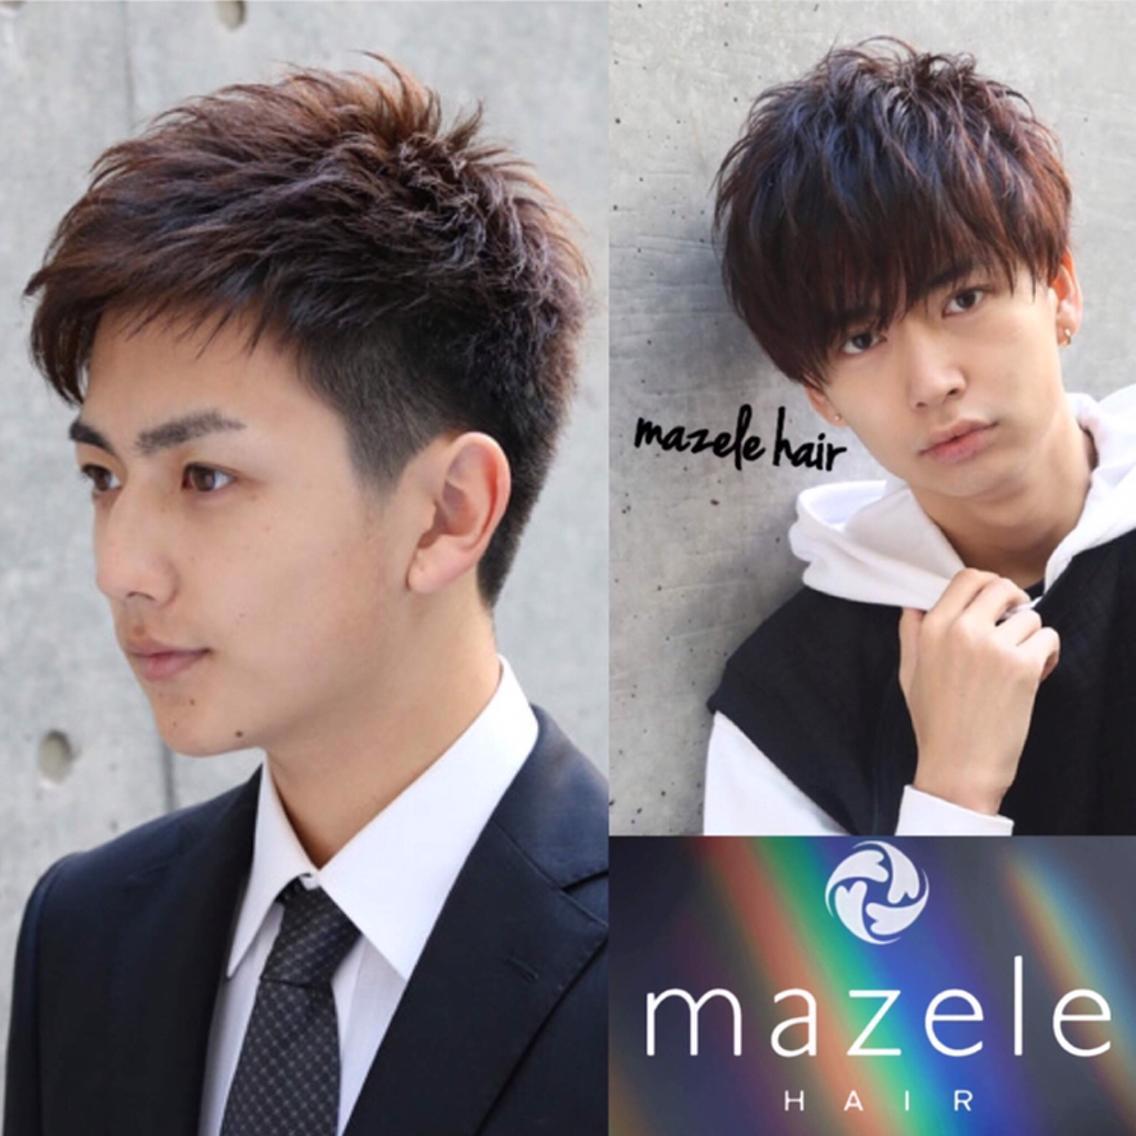 mazele hair所属・小出侑貴の掲載